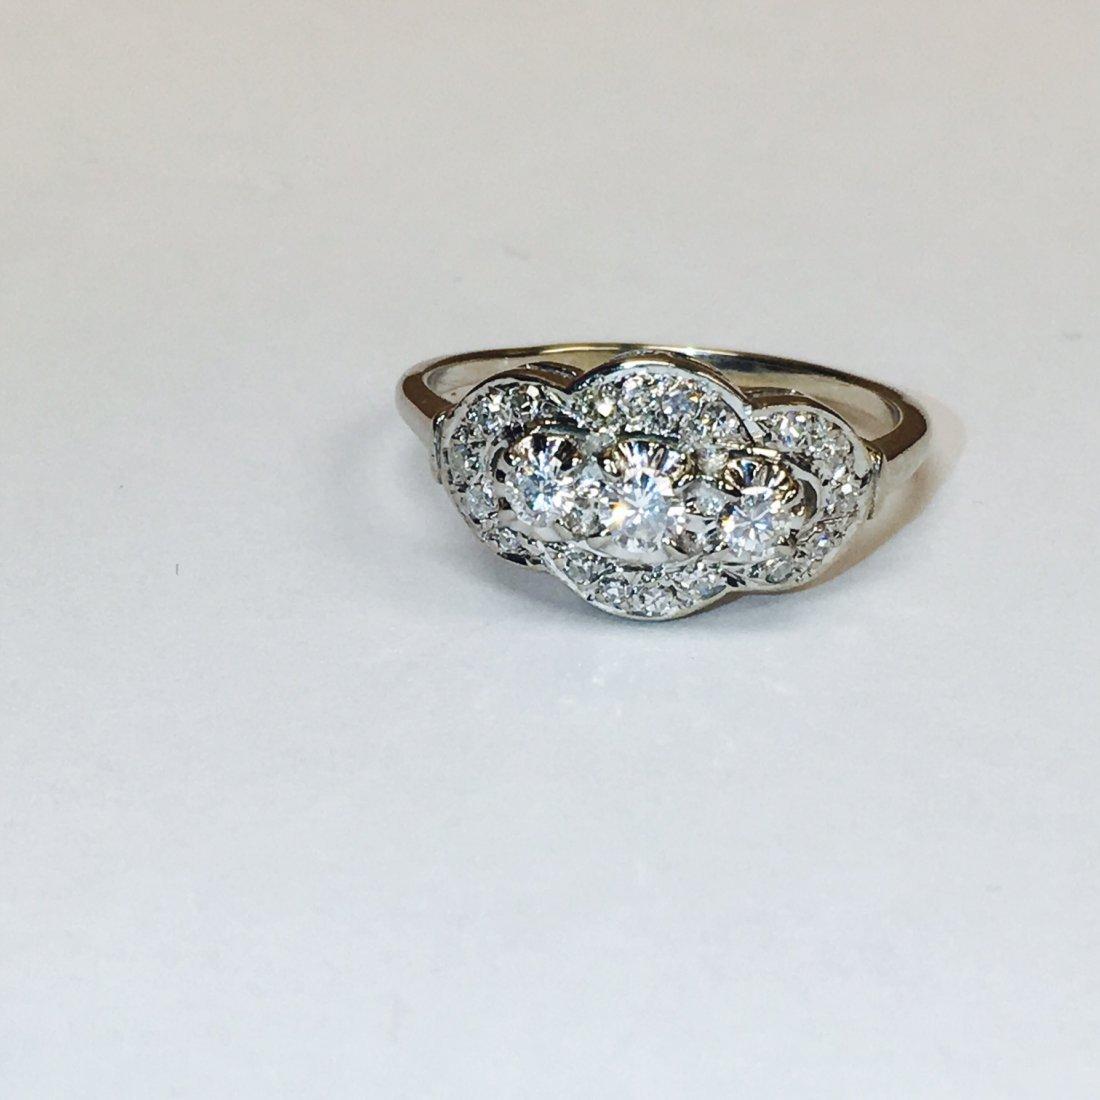 14K White Gold, Antique 1.00 Carat Diamond Ring